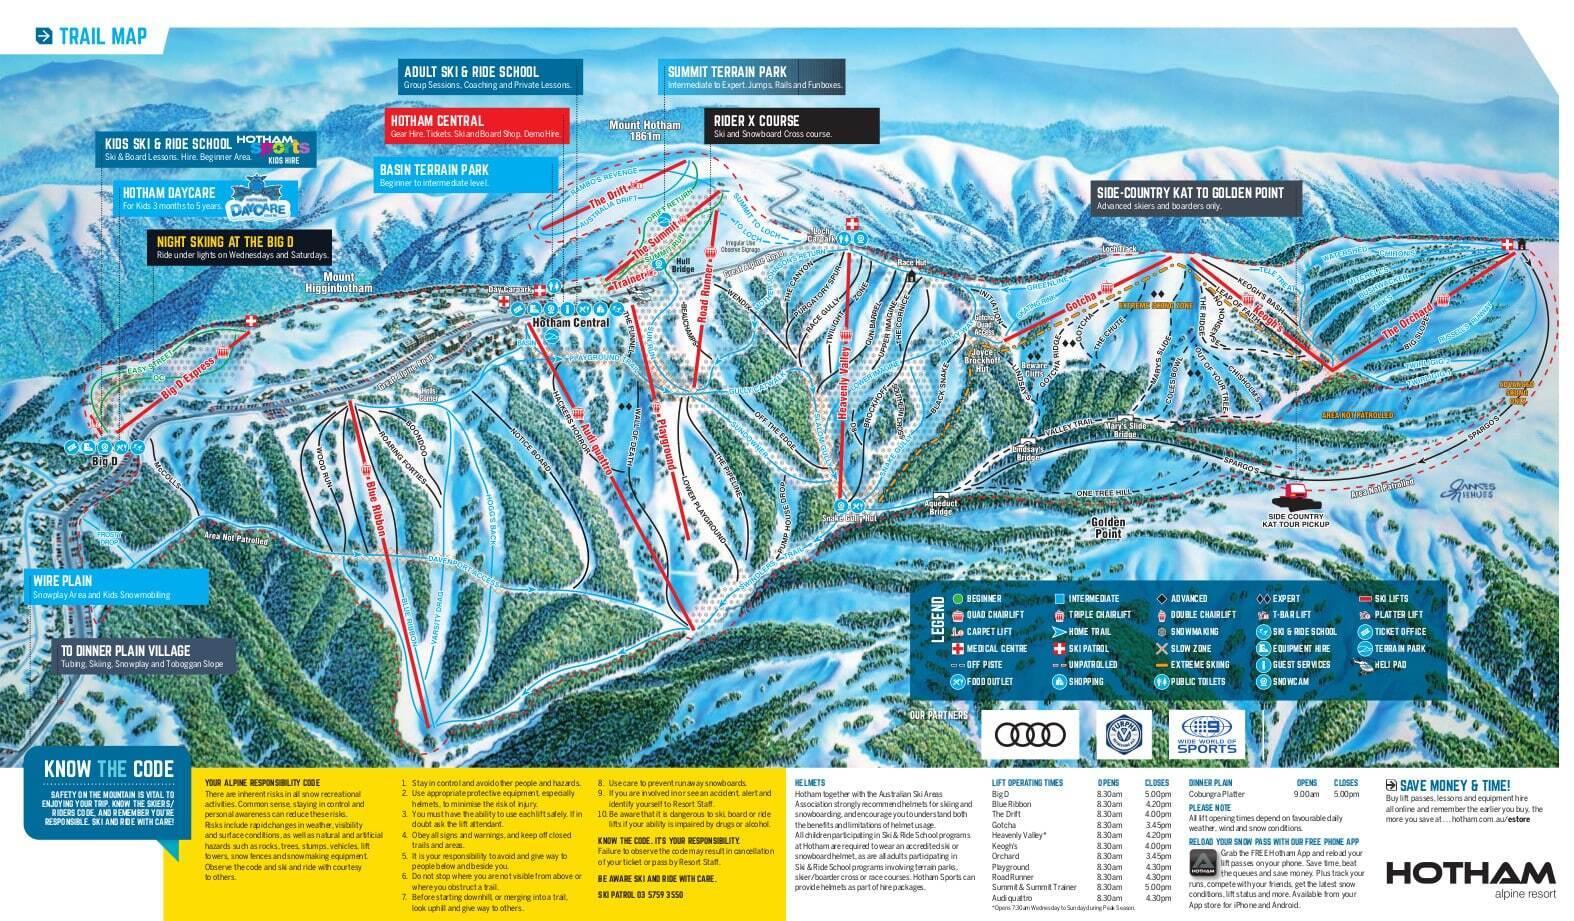 Mount Hotham Piste / Trail Map